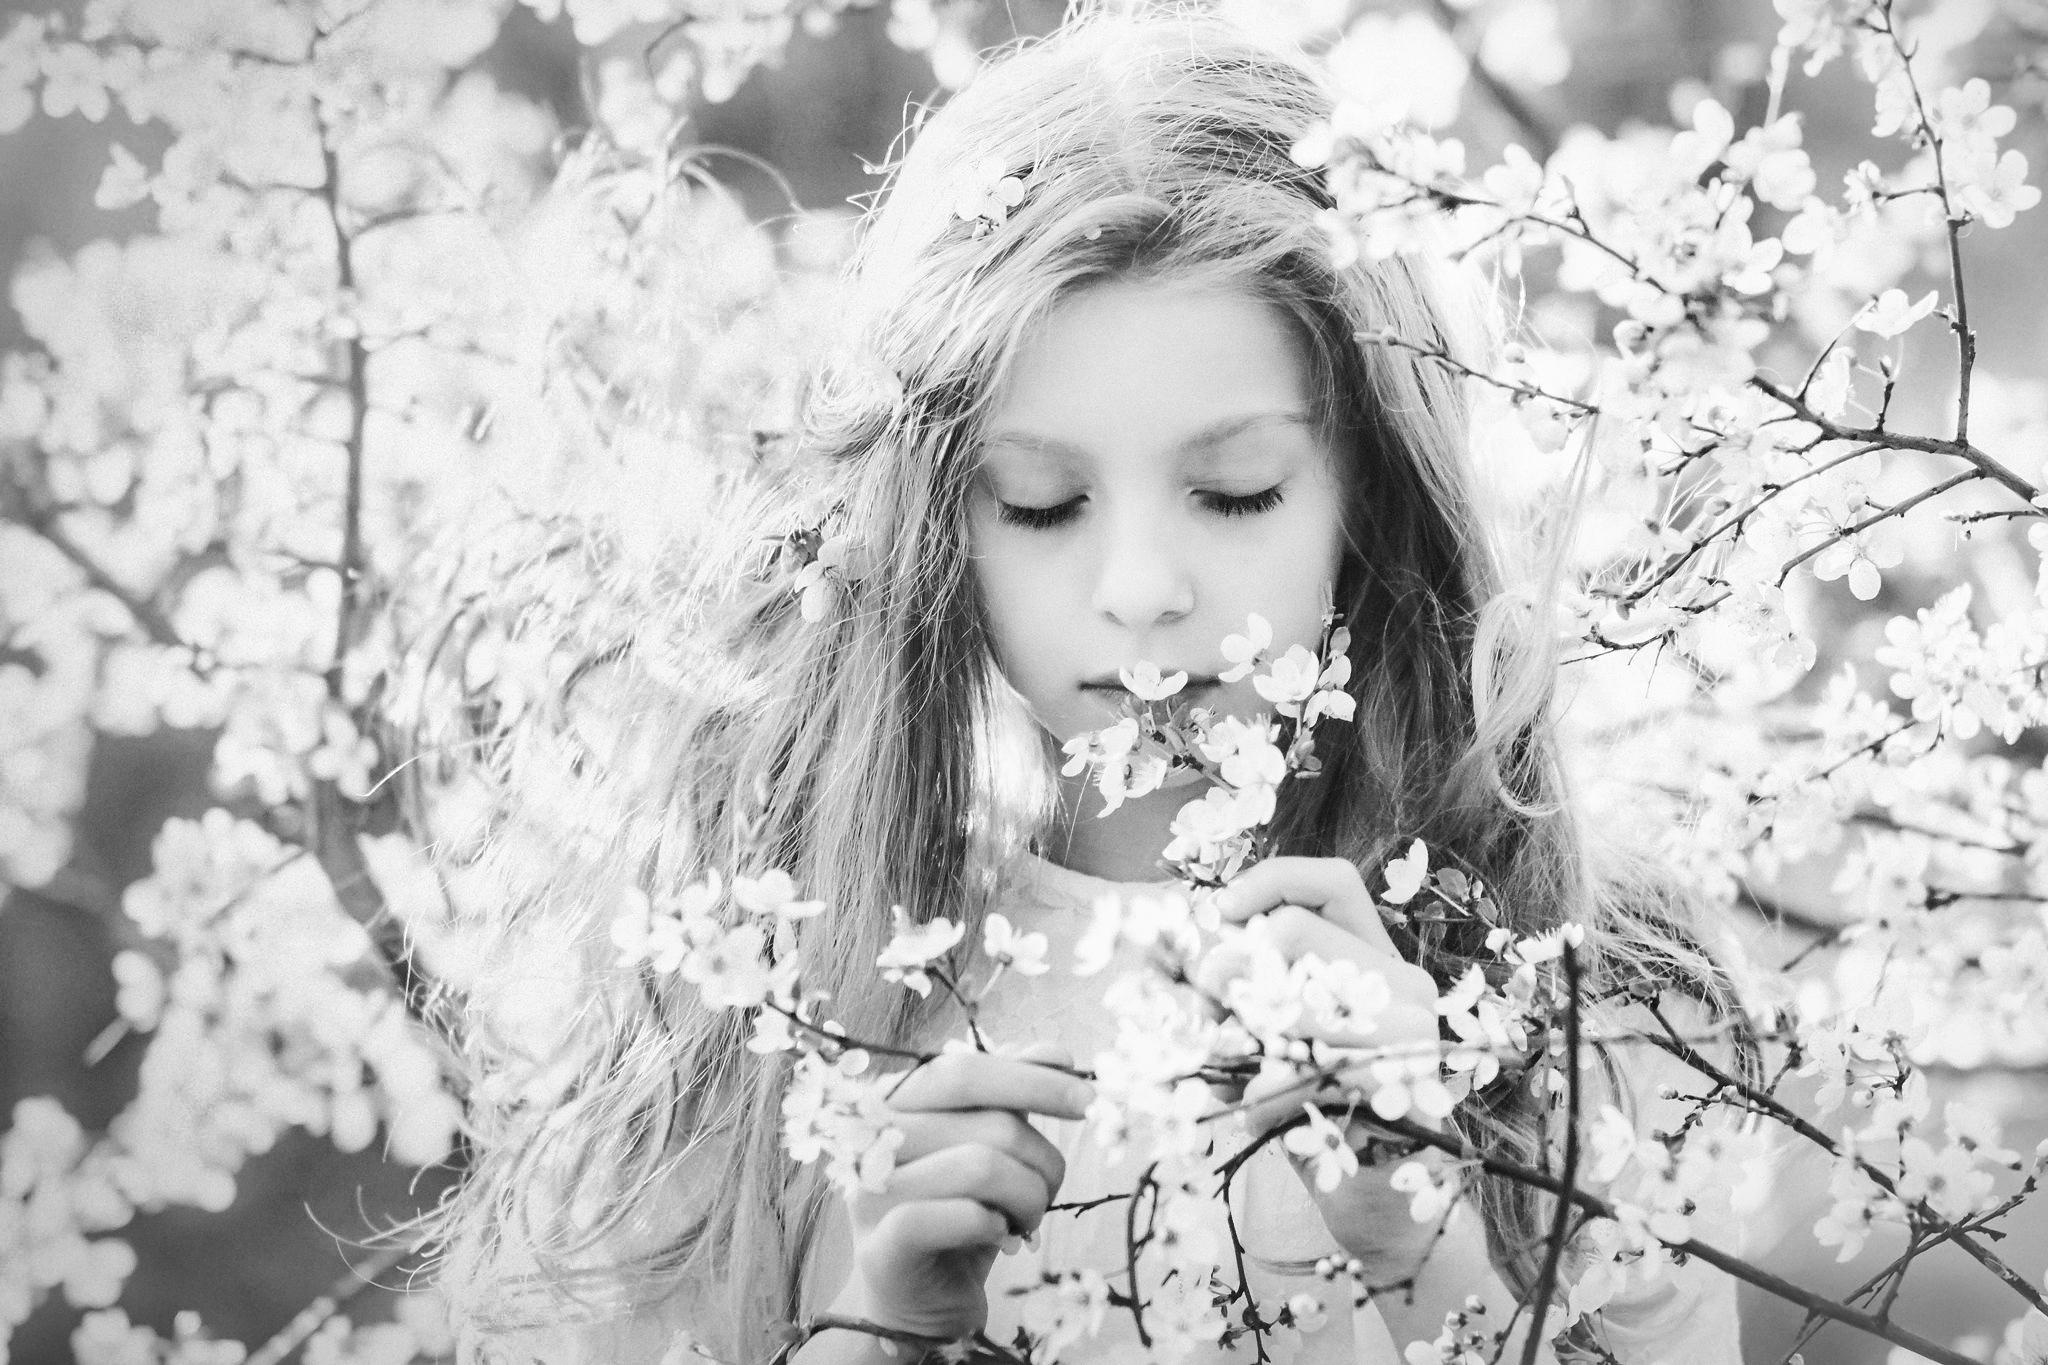 Outdoors Plants Cherry Blossom Children Portrait Long Hair Photography Monochrome Flowers Women Outd 2048x1365